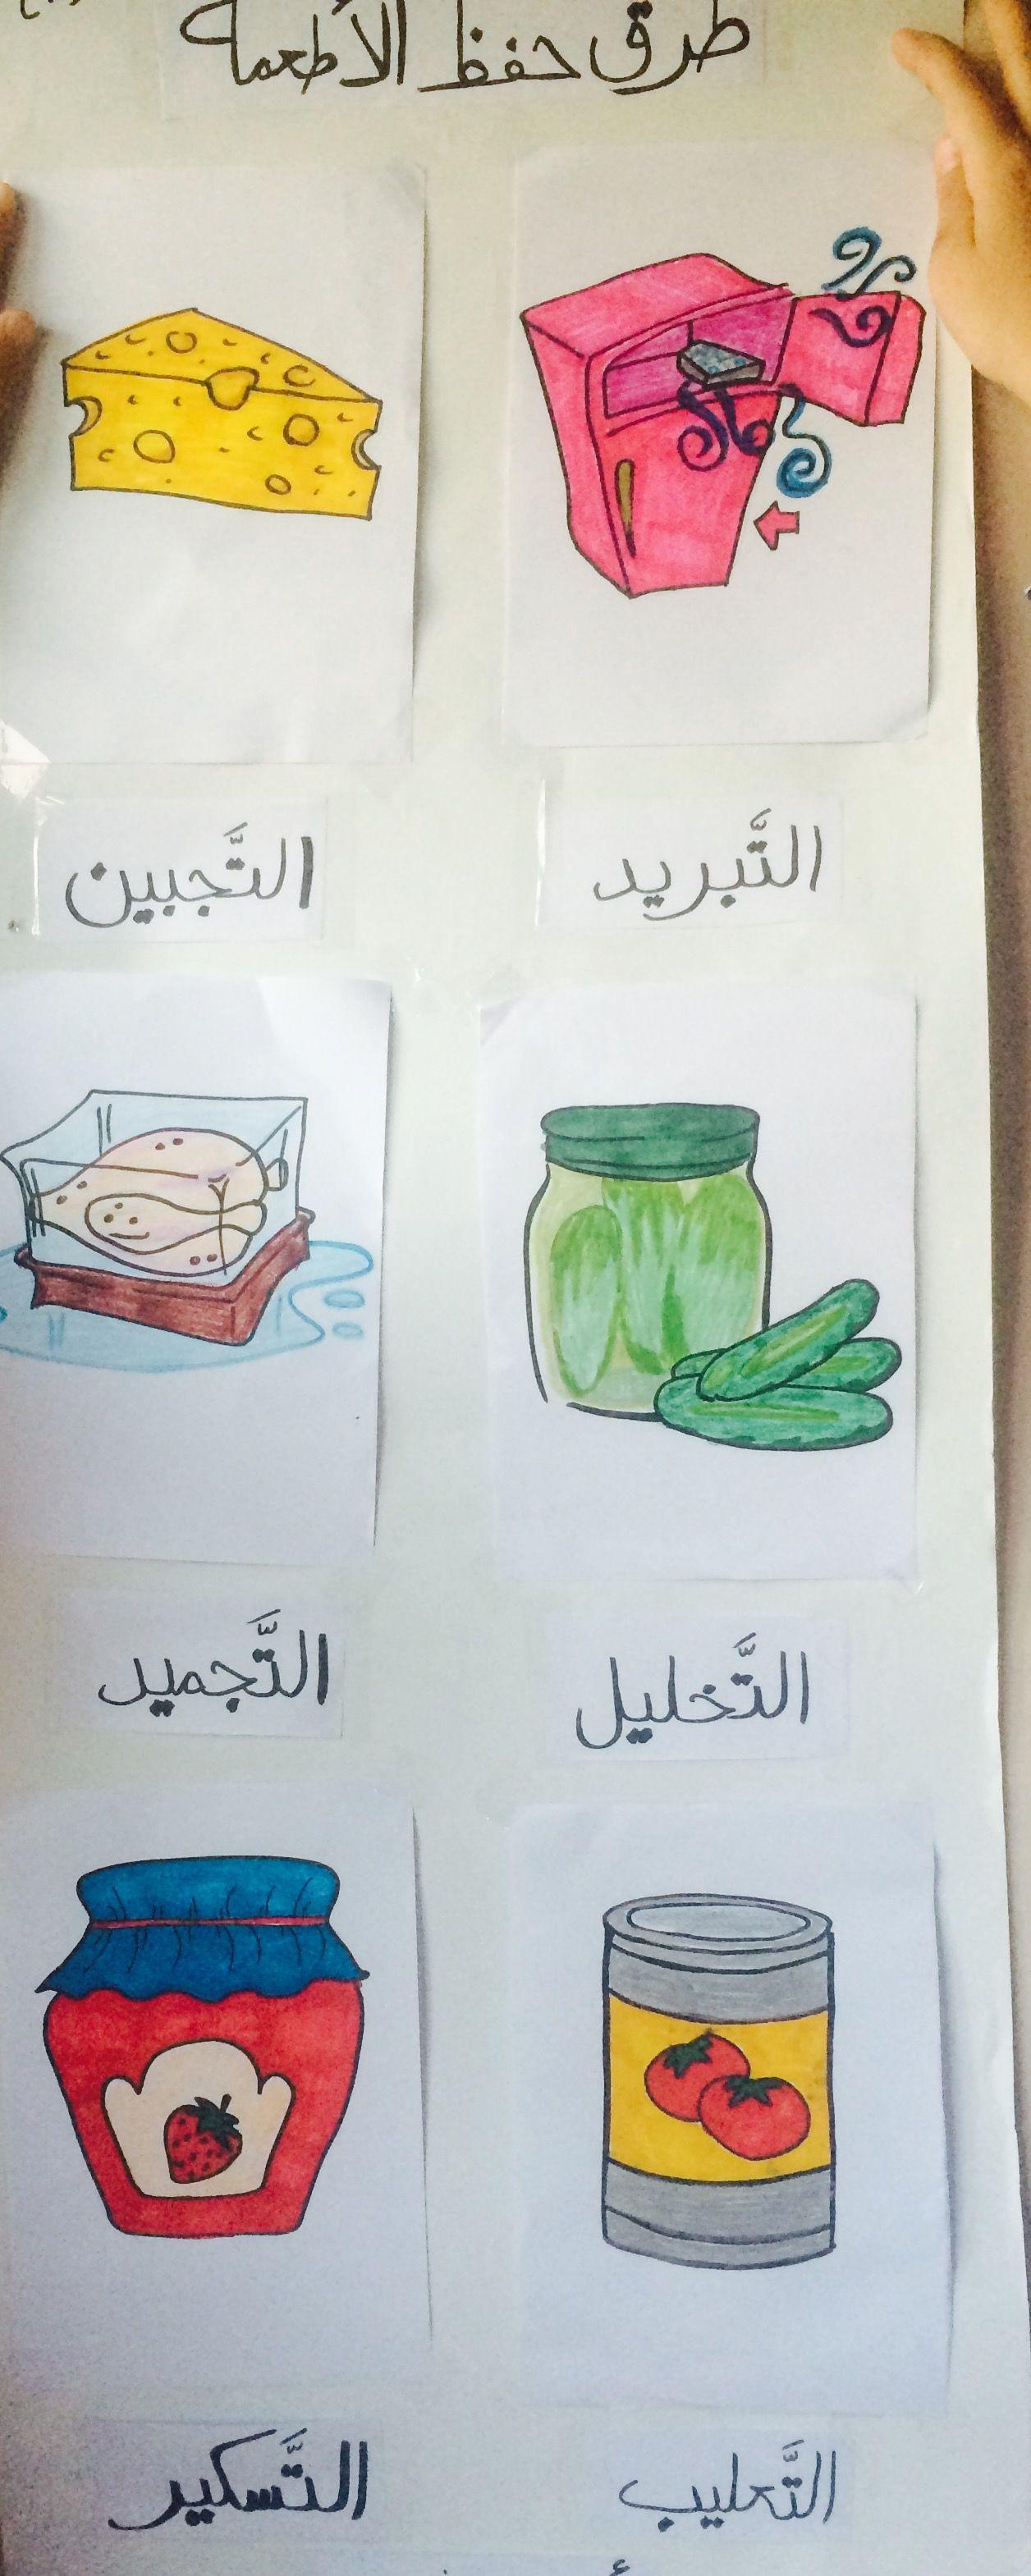 لوحة للأطفال طرق حفظ Poster For Kids About Different Ways Of Storing Foodالاطعمة Healthy Food Activities For Preschool Healthy Food Activities Food Activities